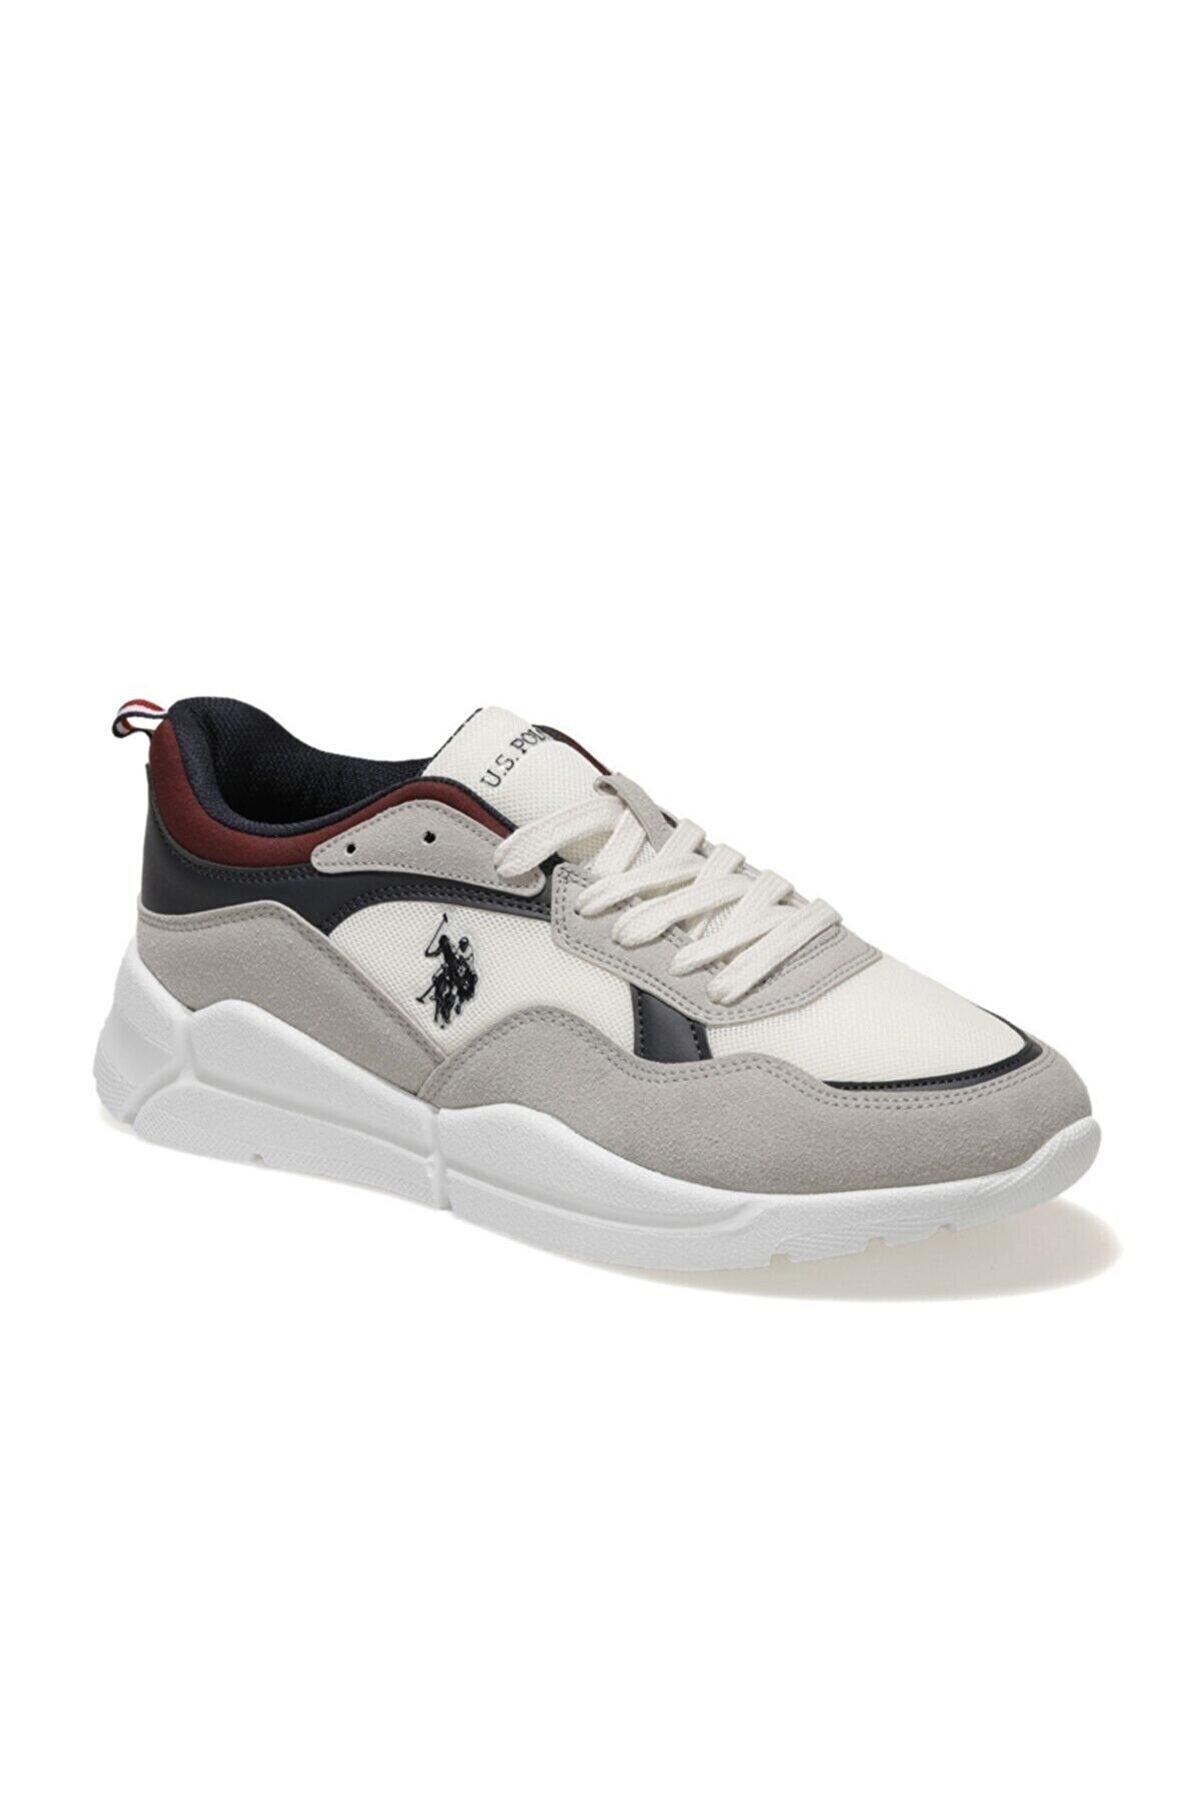 US Polo Assn CALLUM SMR 1FX Beyaz Erkek Sneaker Ayakkabı 100909688